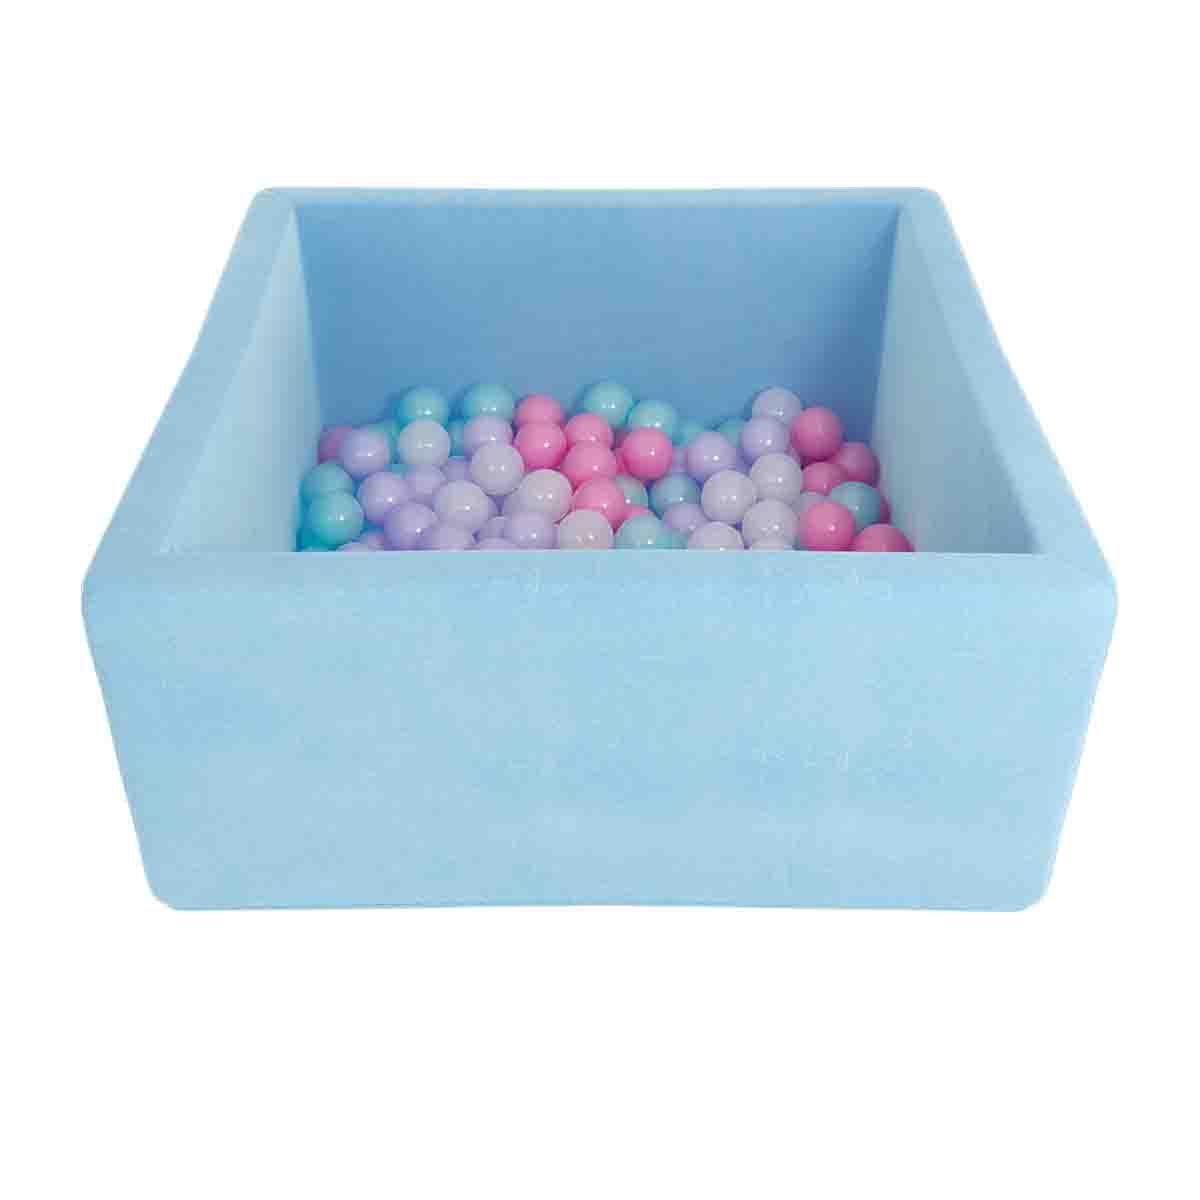 Купить Детский сухой бассейн Romana Airpool Box, голубой + 200 шаров, Romana (Романа)